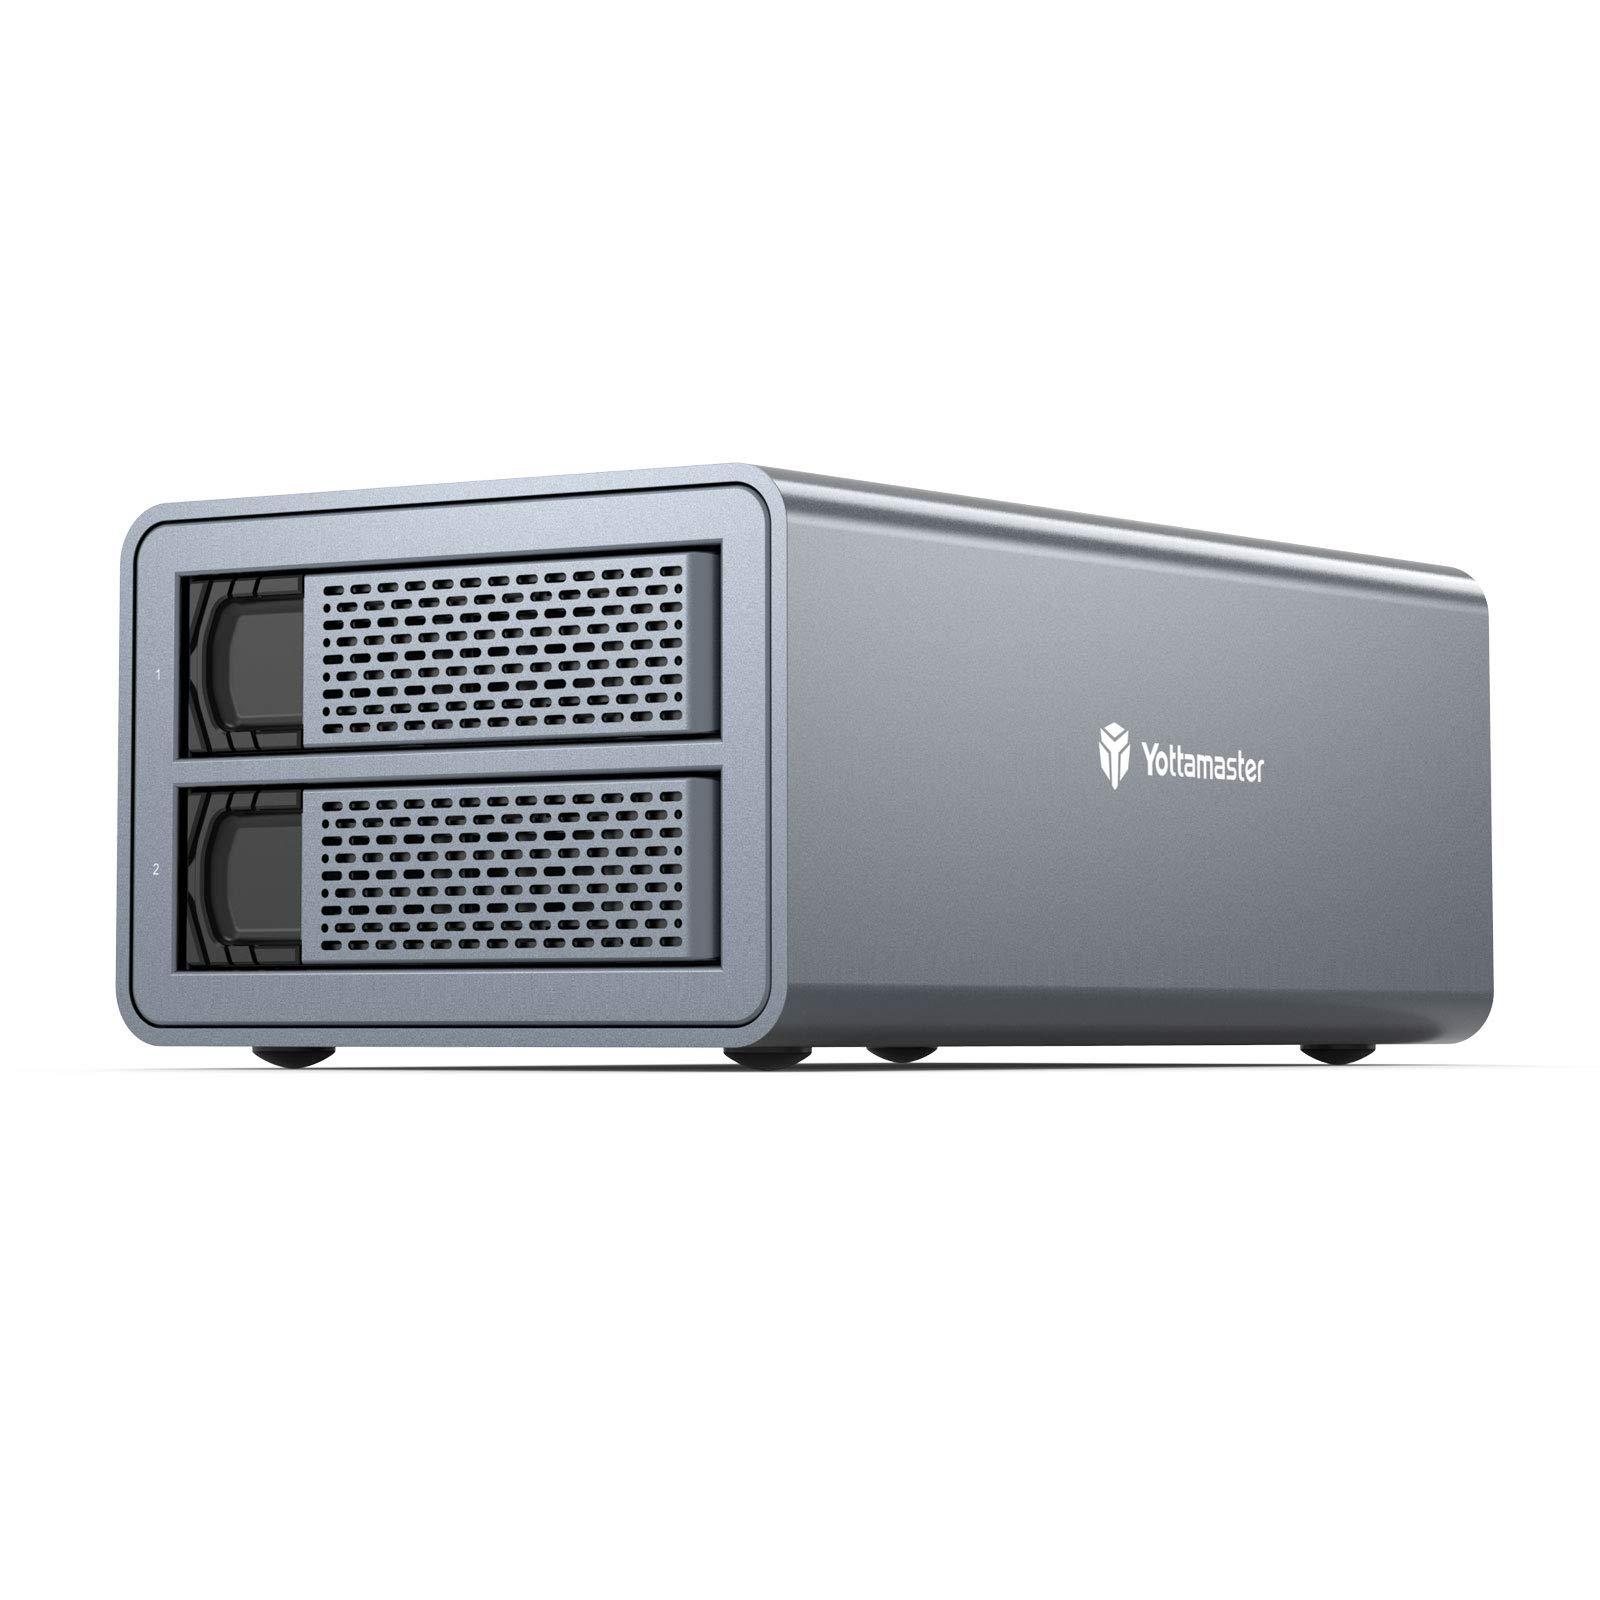 Yottamaster Aluminum Alloy 2 Bay 2.5 USB3.0 Hard Drive RAID Enclosure for 2.5 Inch SSD//HDD Silver